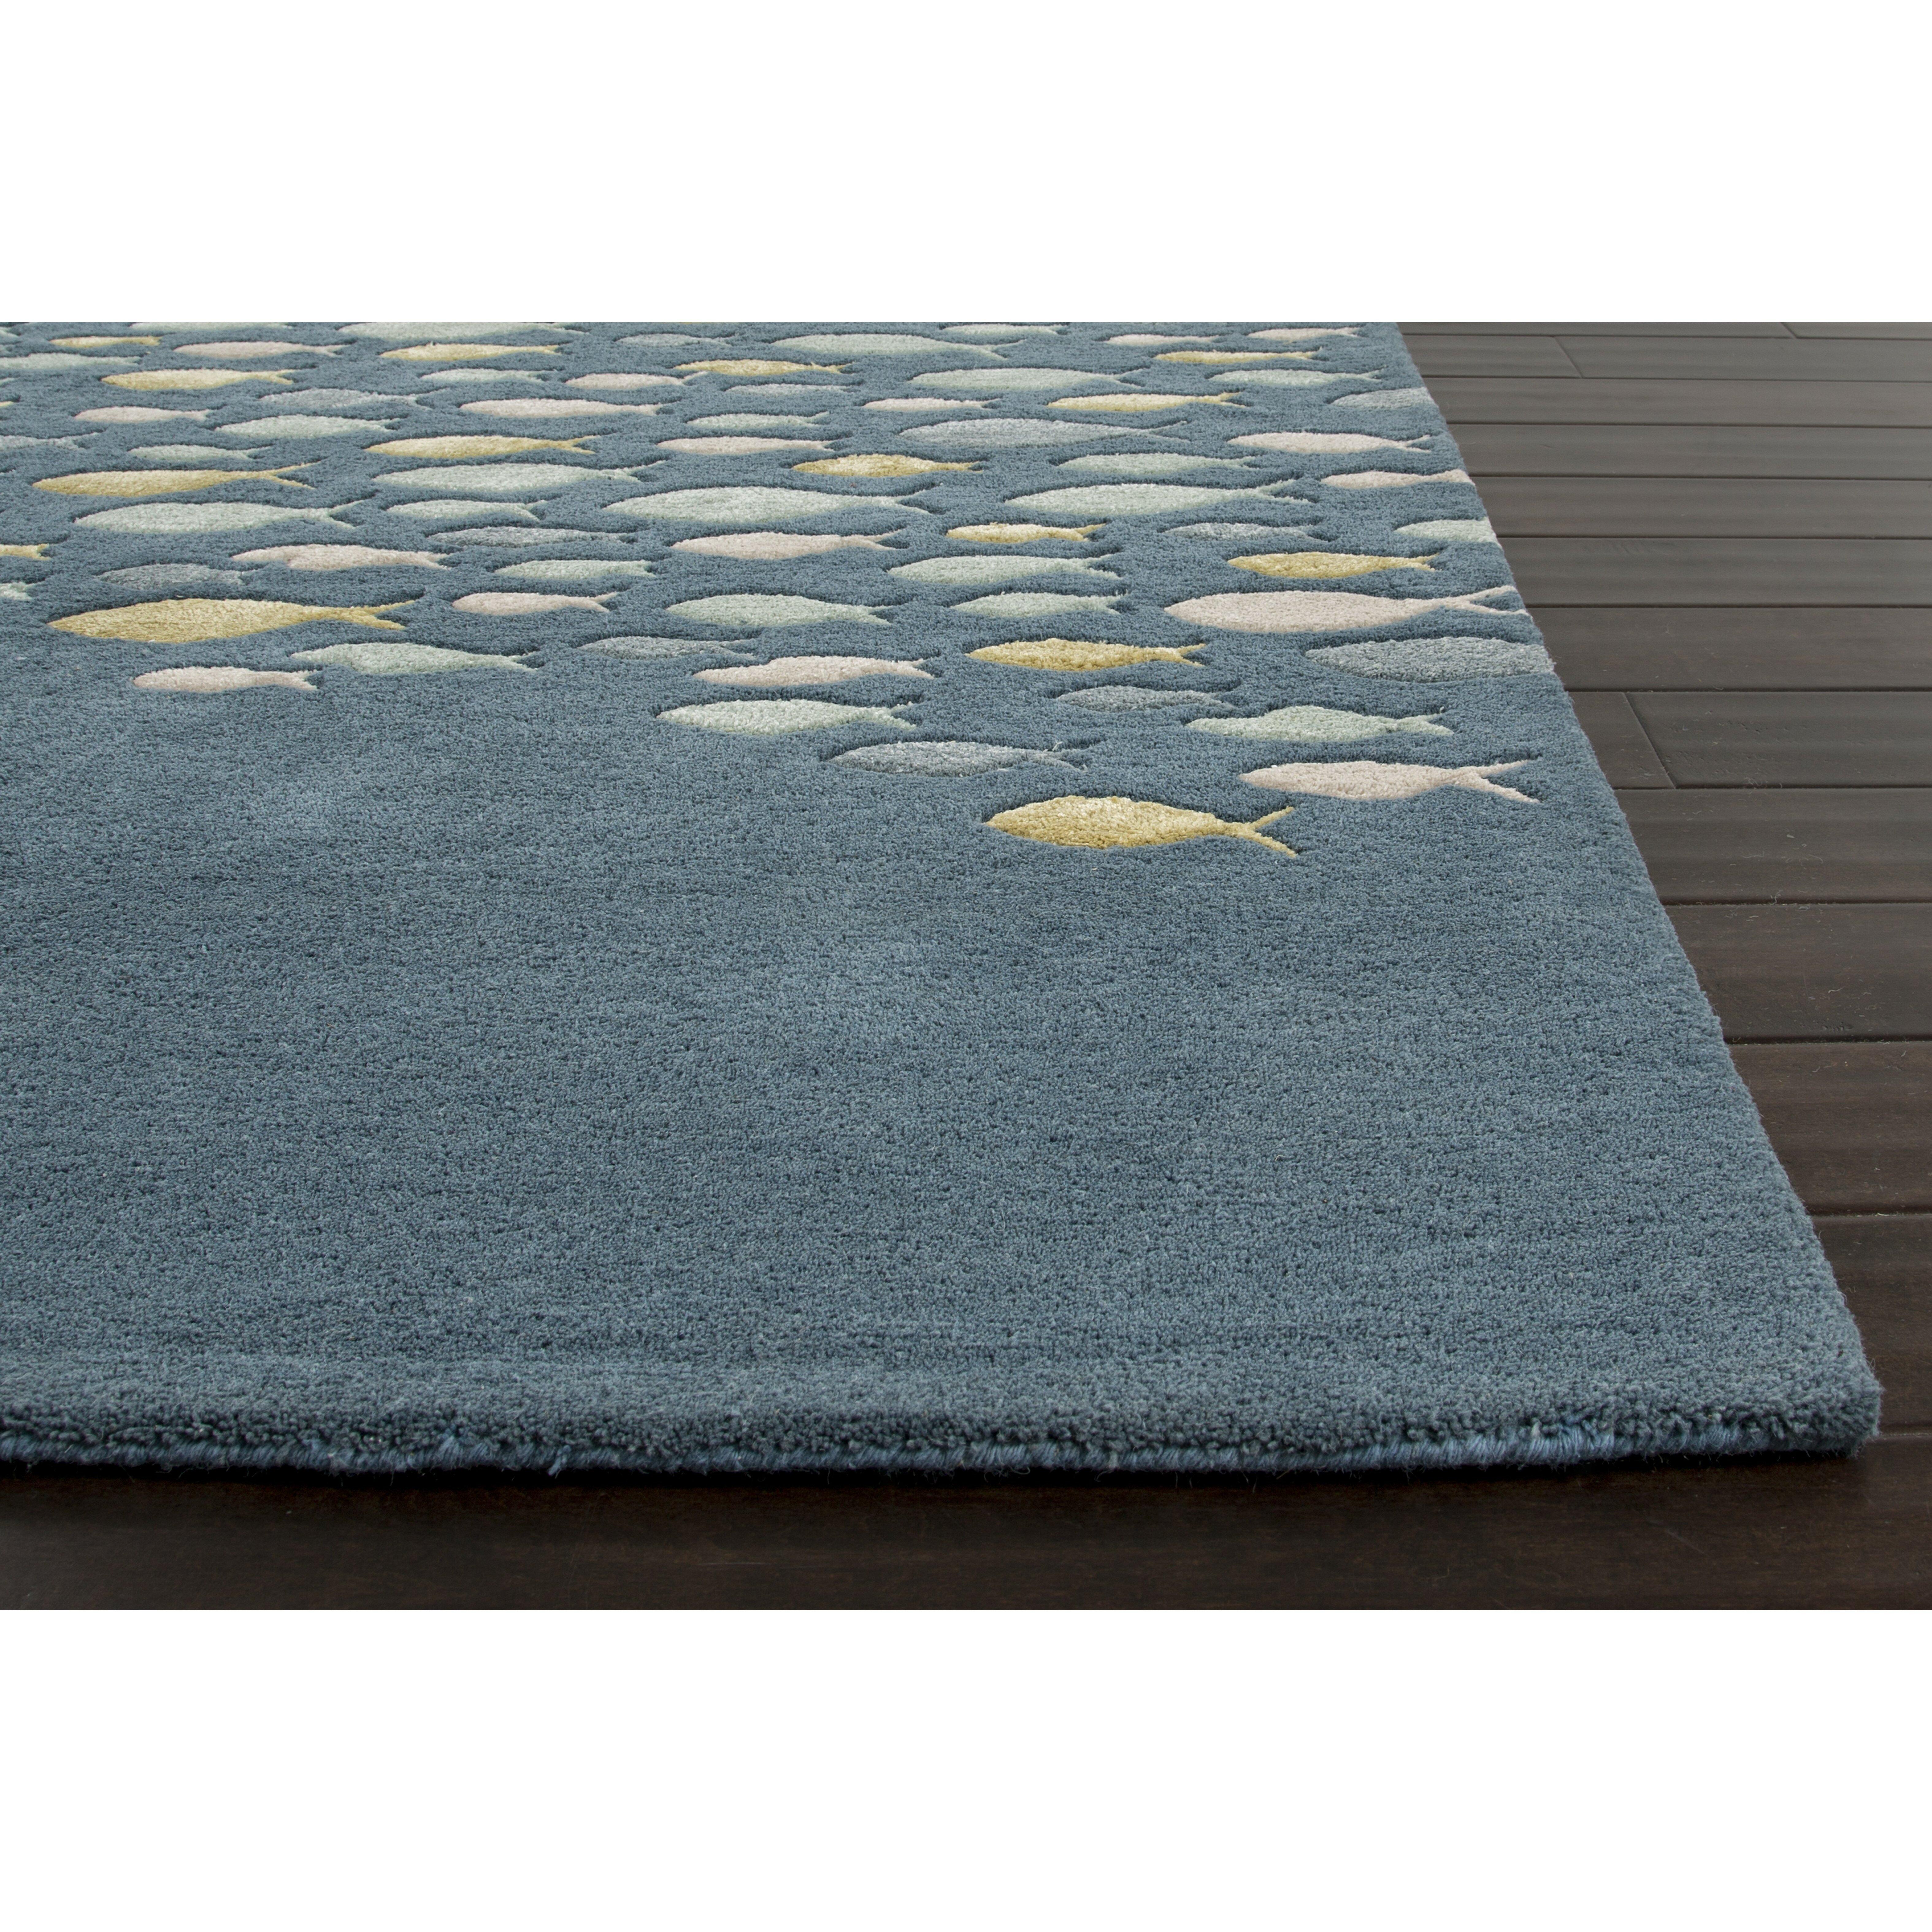 jaipurliving c l hand tufted gray blue area rug reviews wayfair. Black Bedroom Furniture Sets. Home Design Ideas